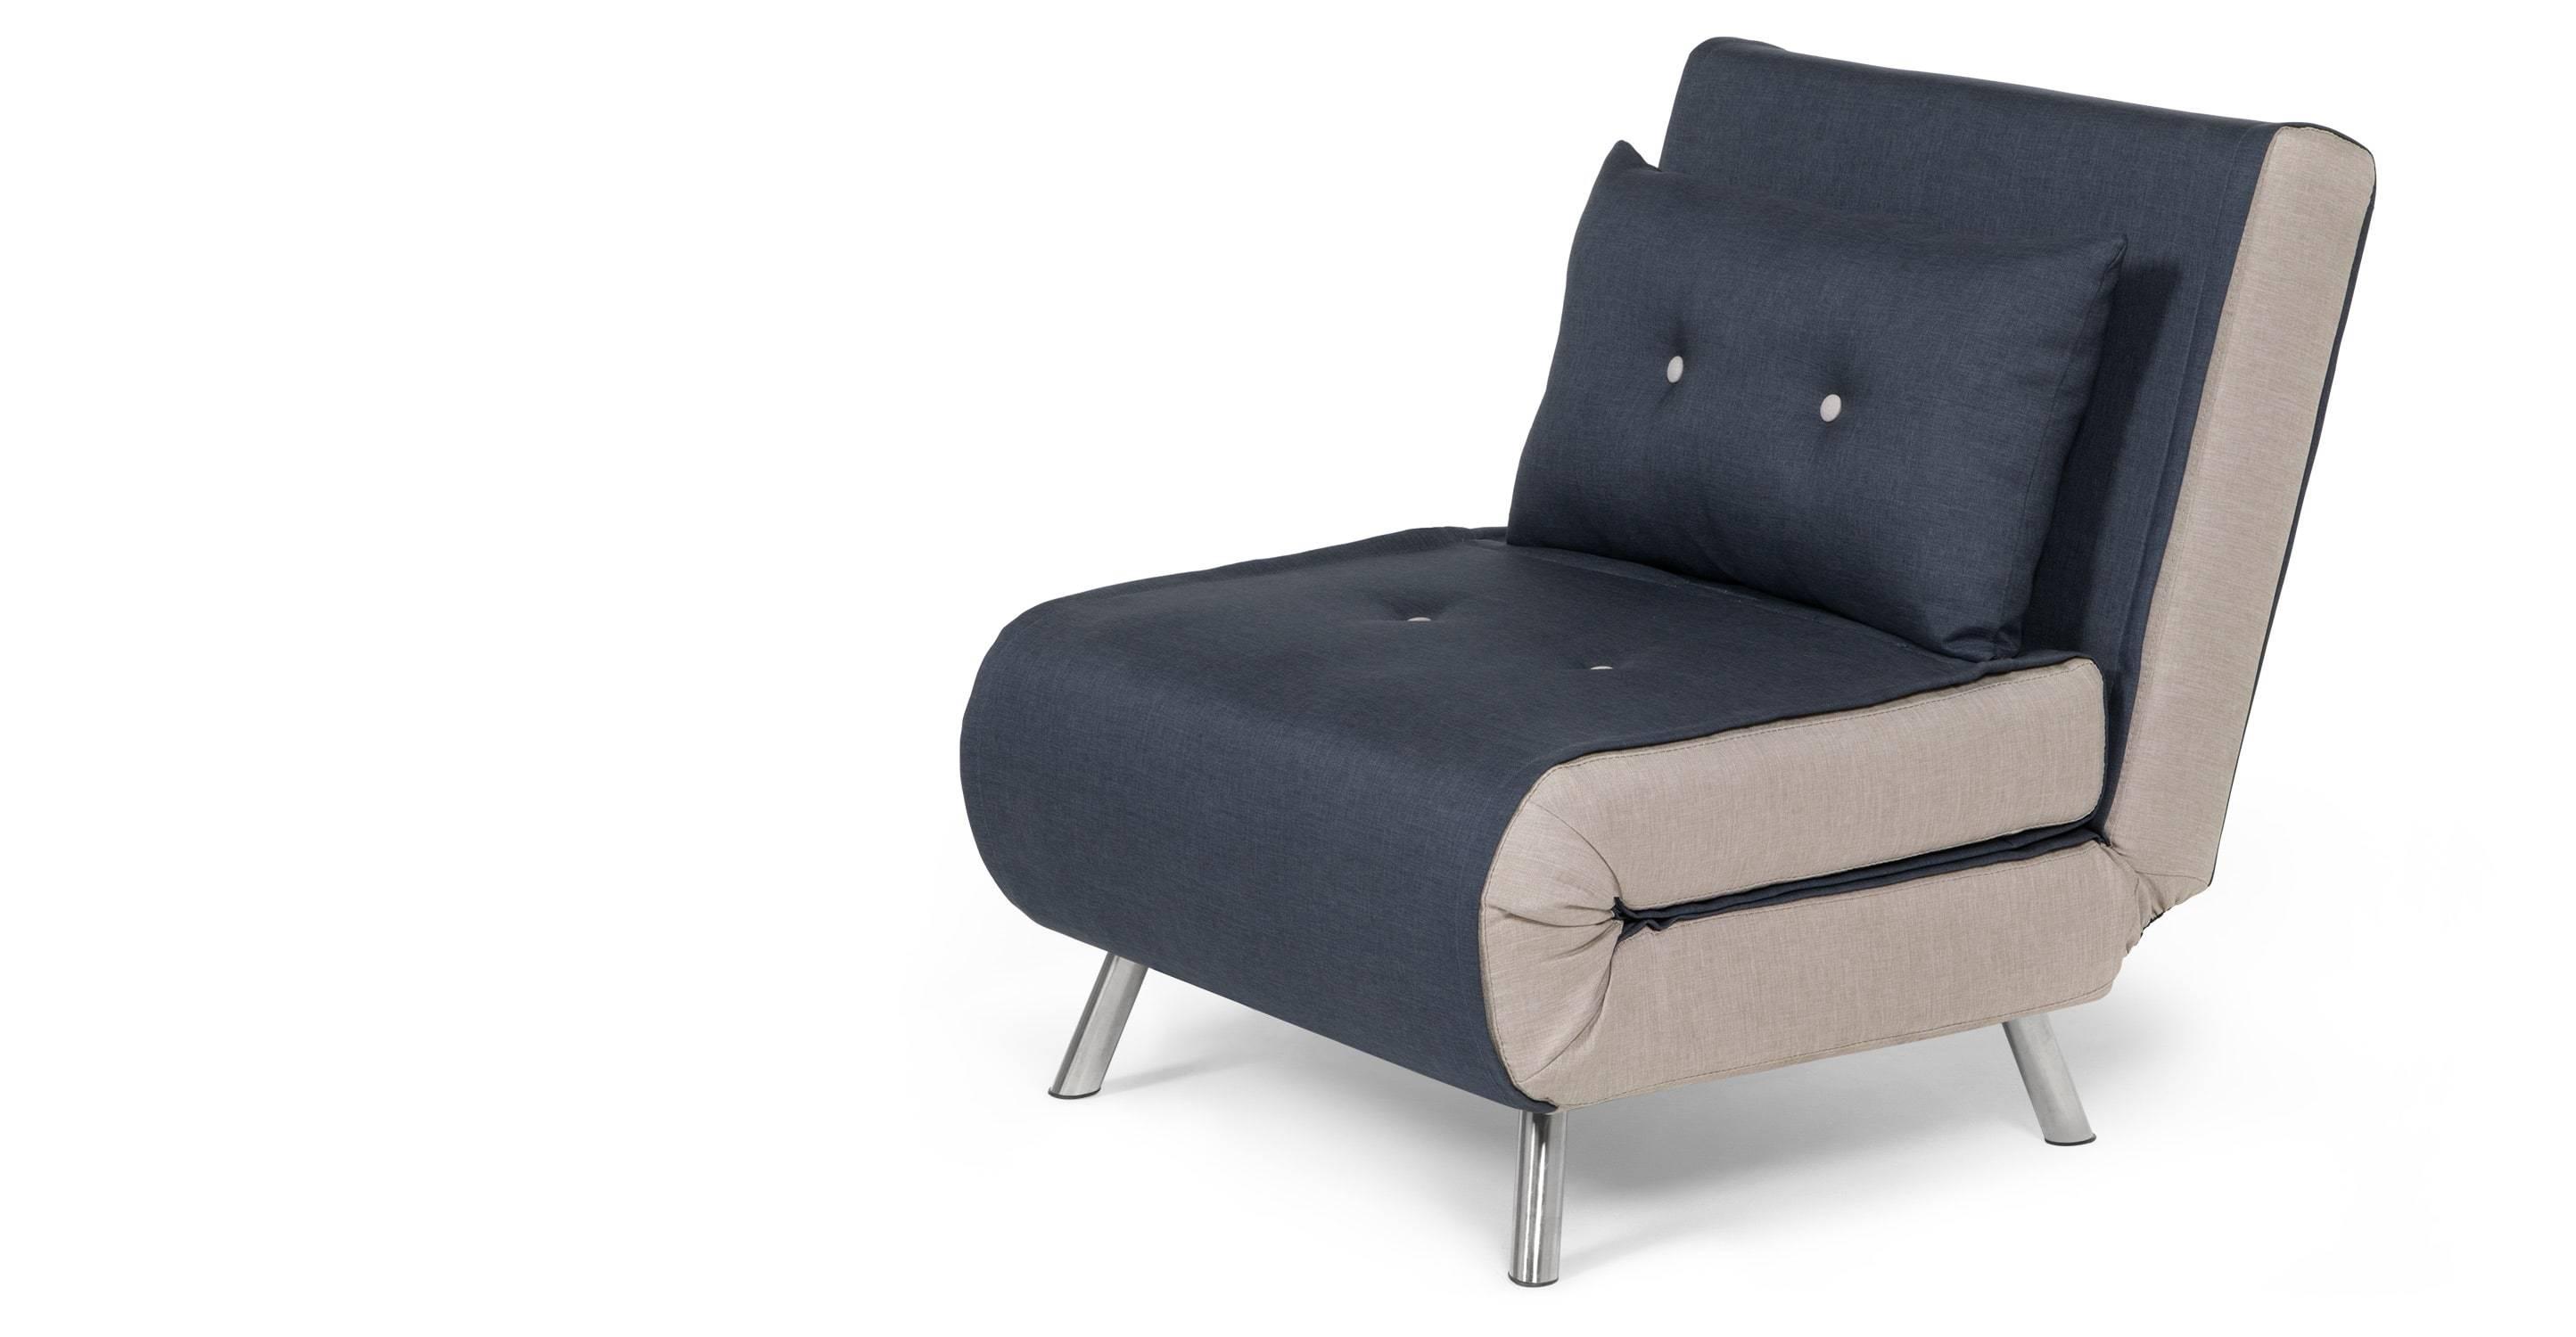 Sofas Center : Literarywondrousingleofa Chair Picture Ideasofabed with regard to Single Sofa Chairs (Image 26 of 30)